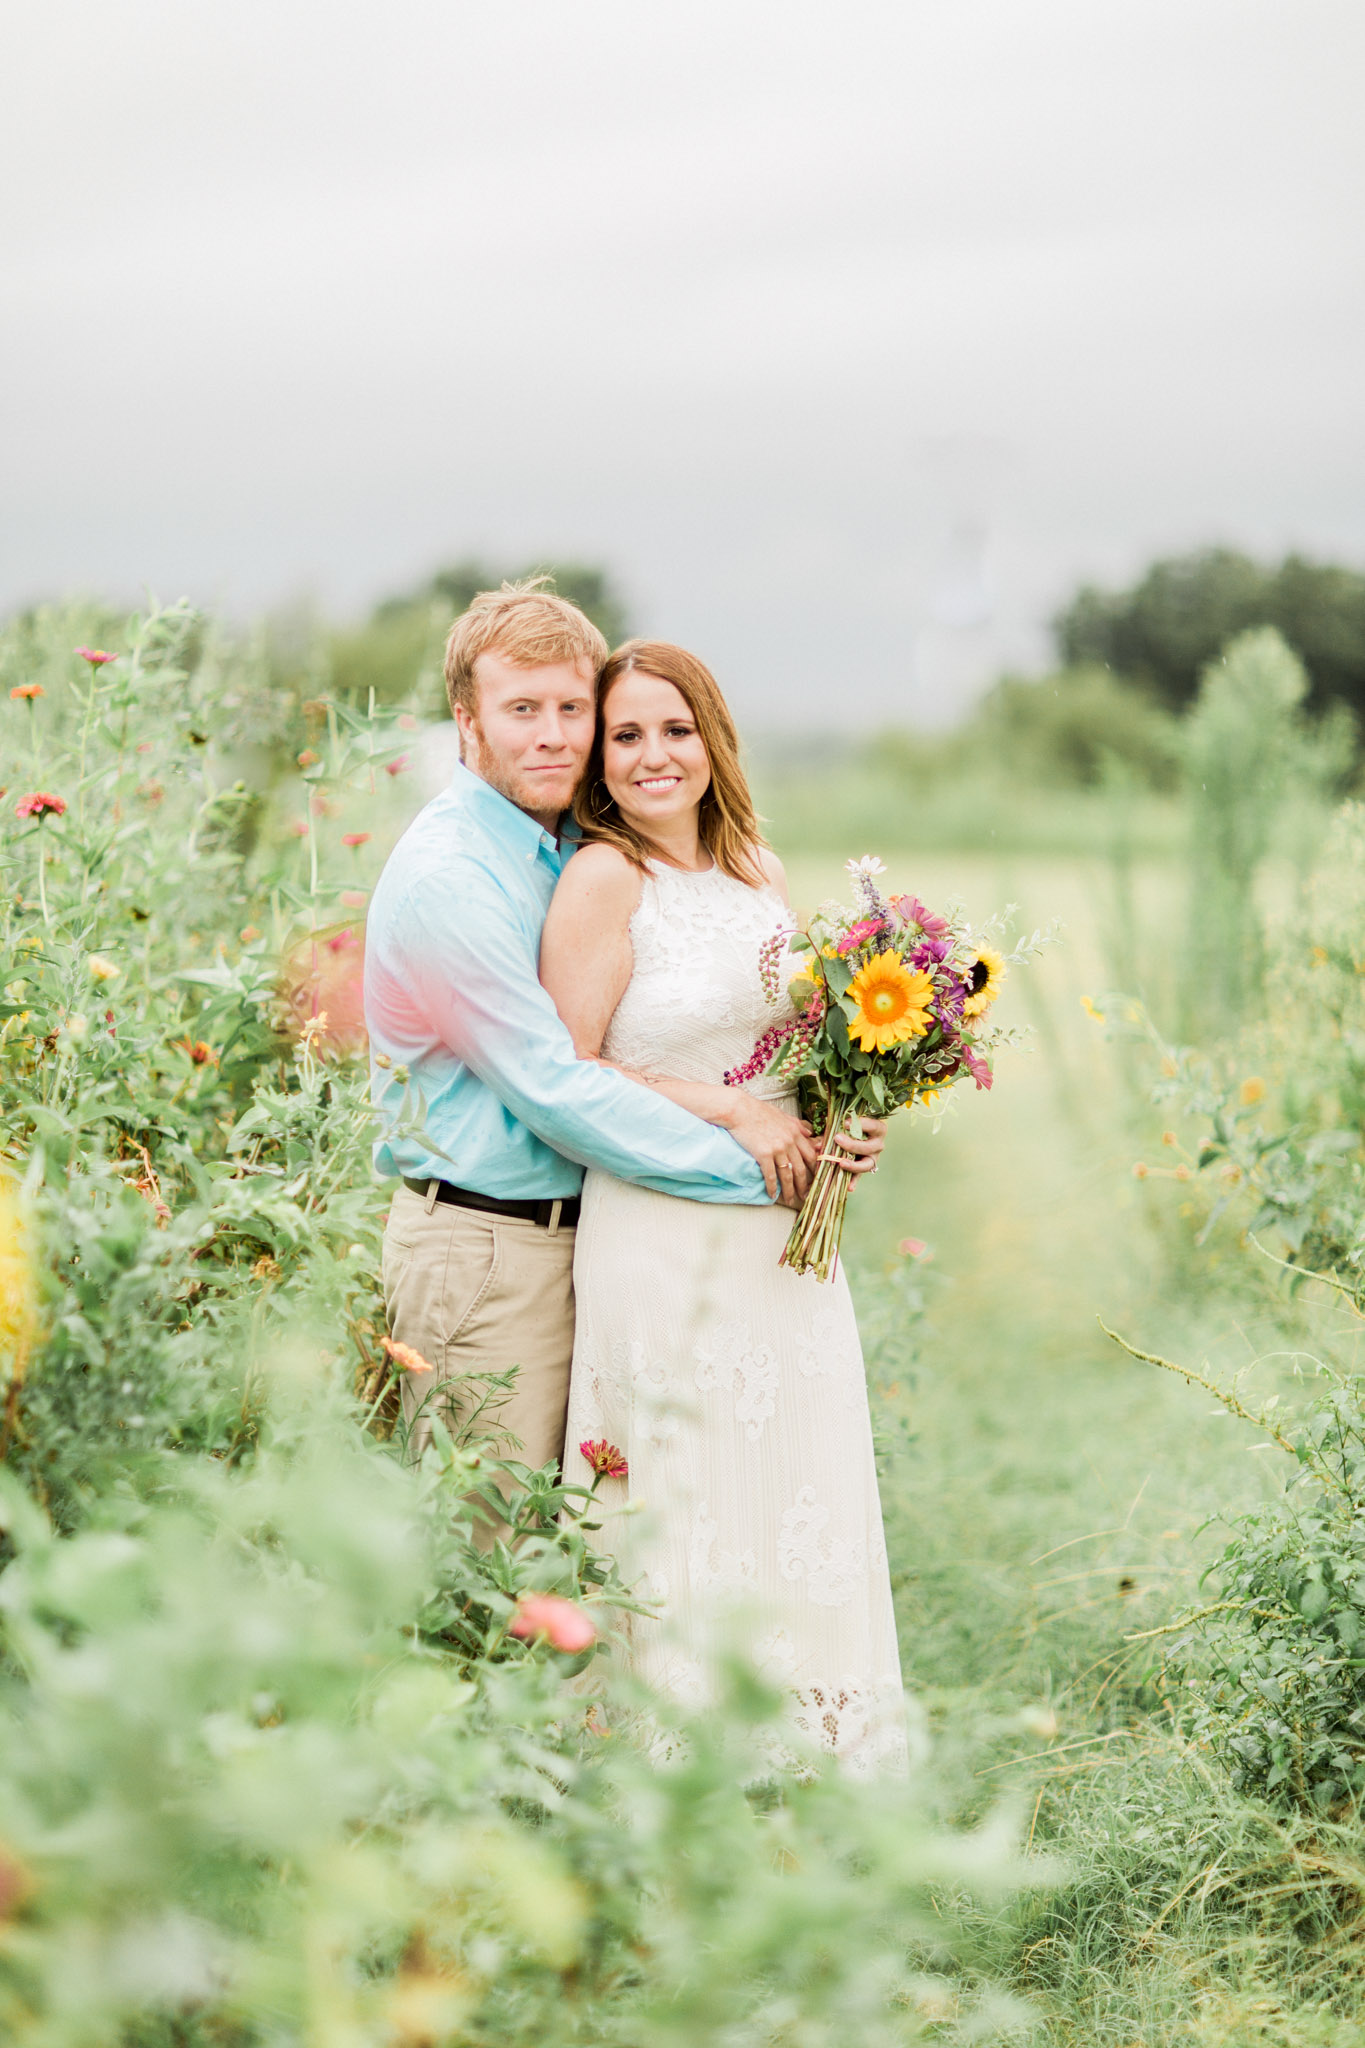 North Texas Engagement Photos - Fine Art Photographer